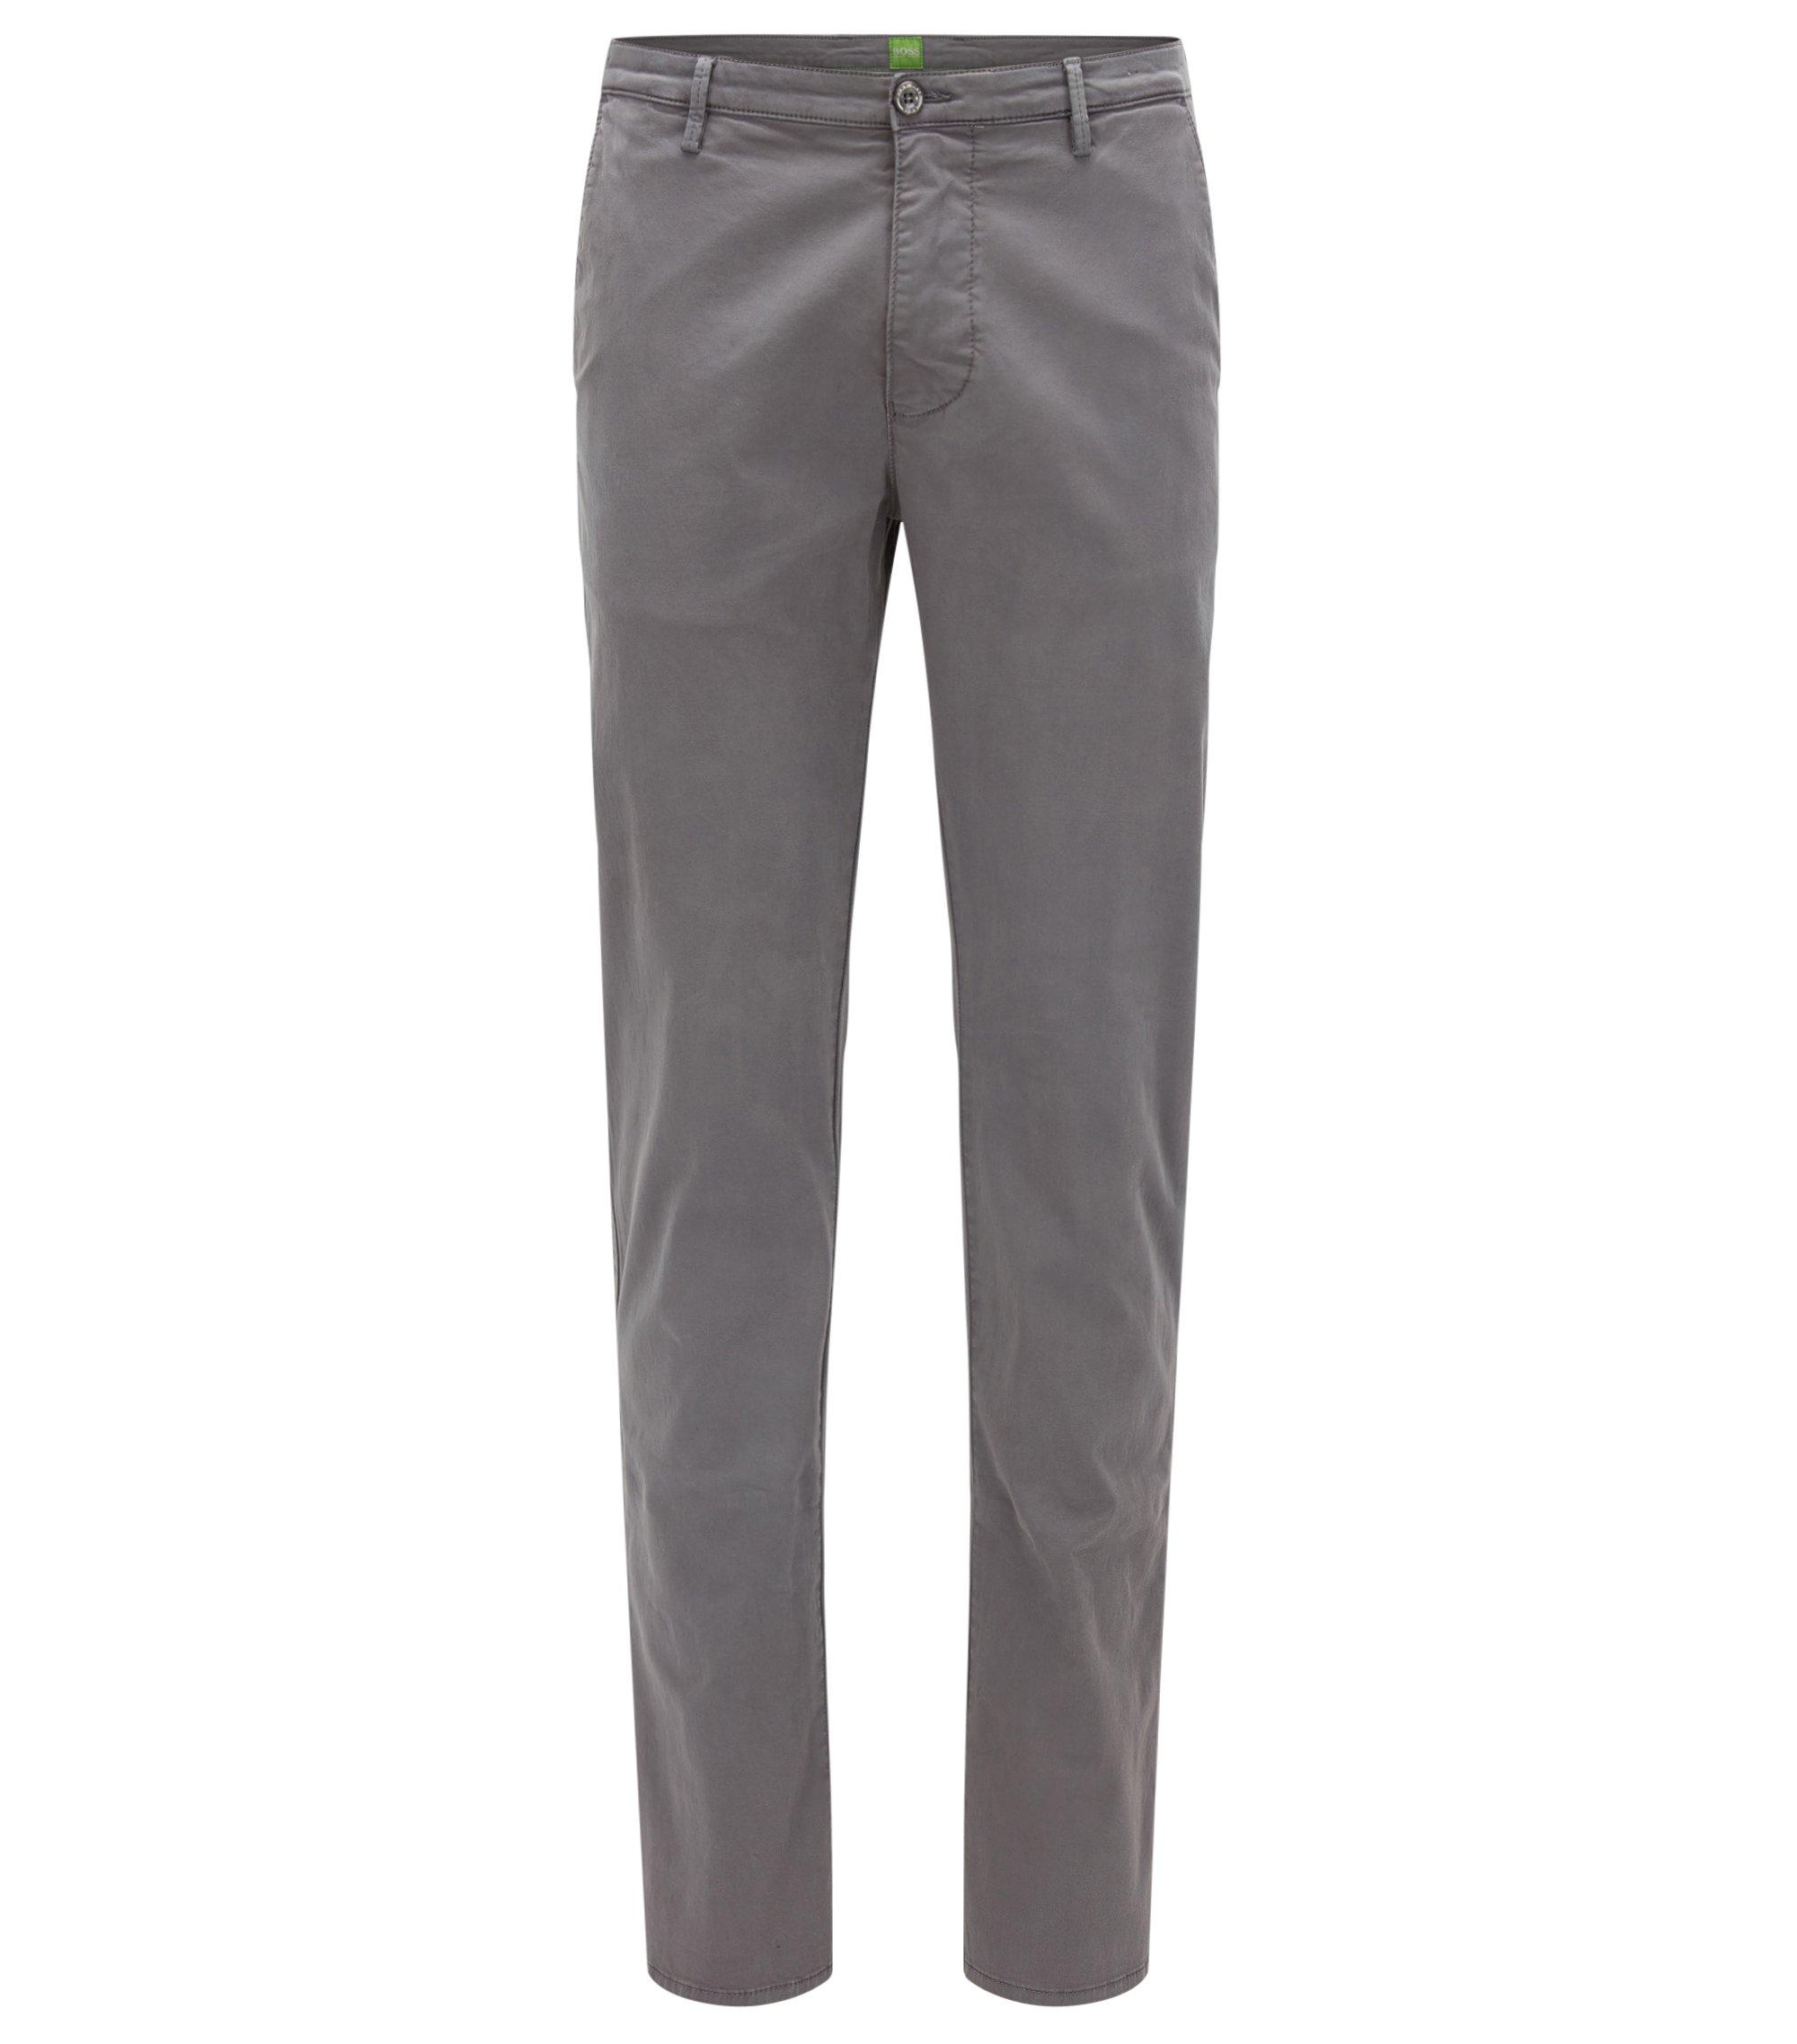 Pantalon Slim Fit en coton Pima stretch, Gris